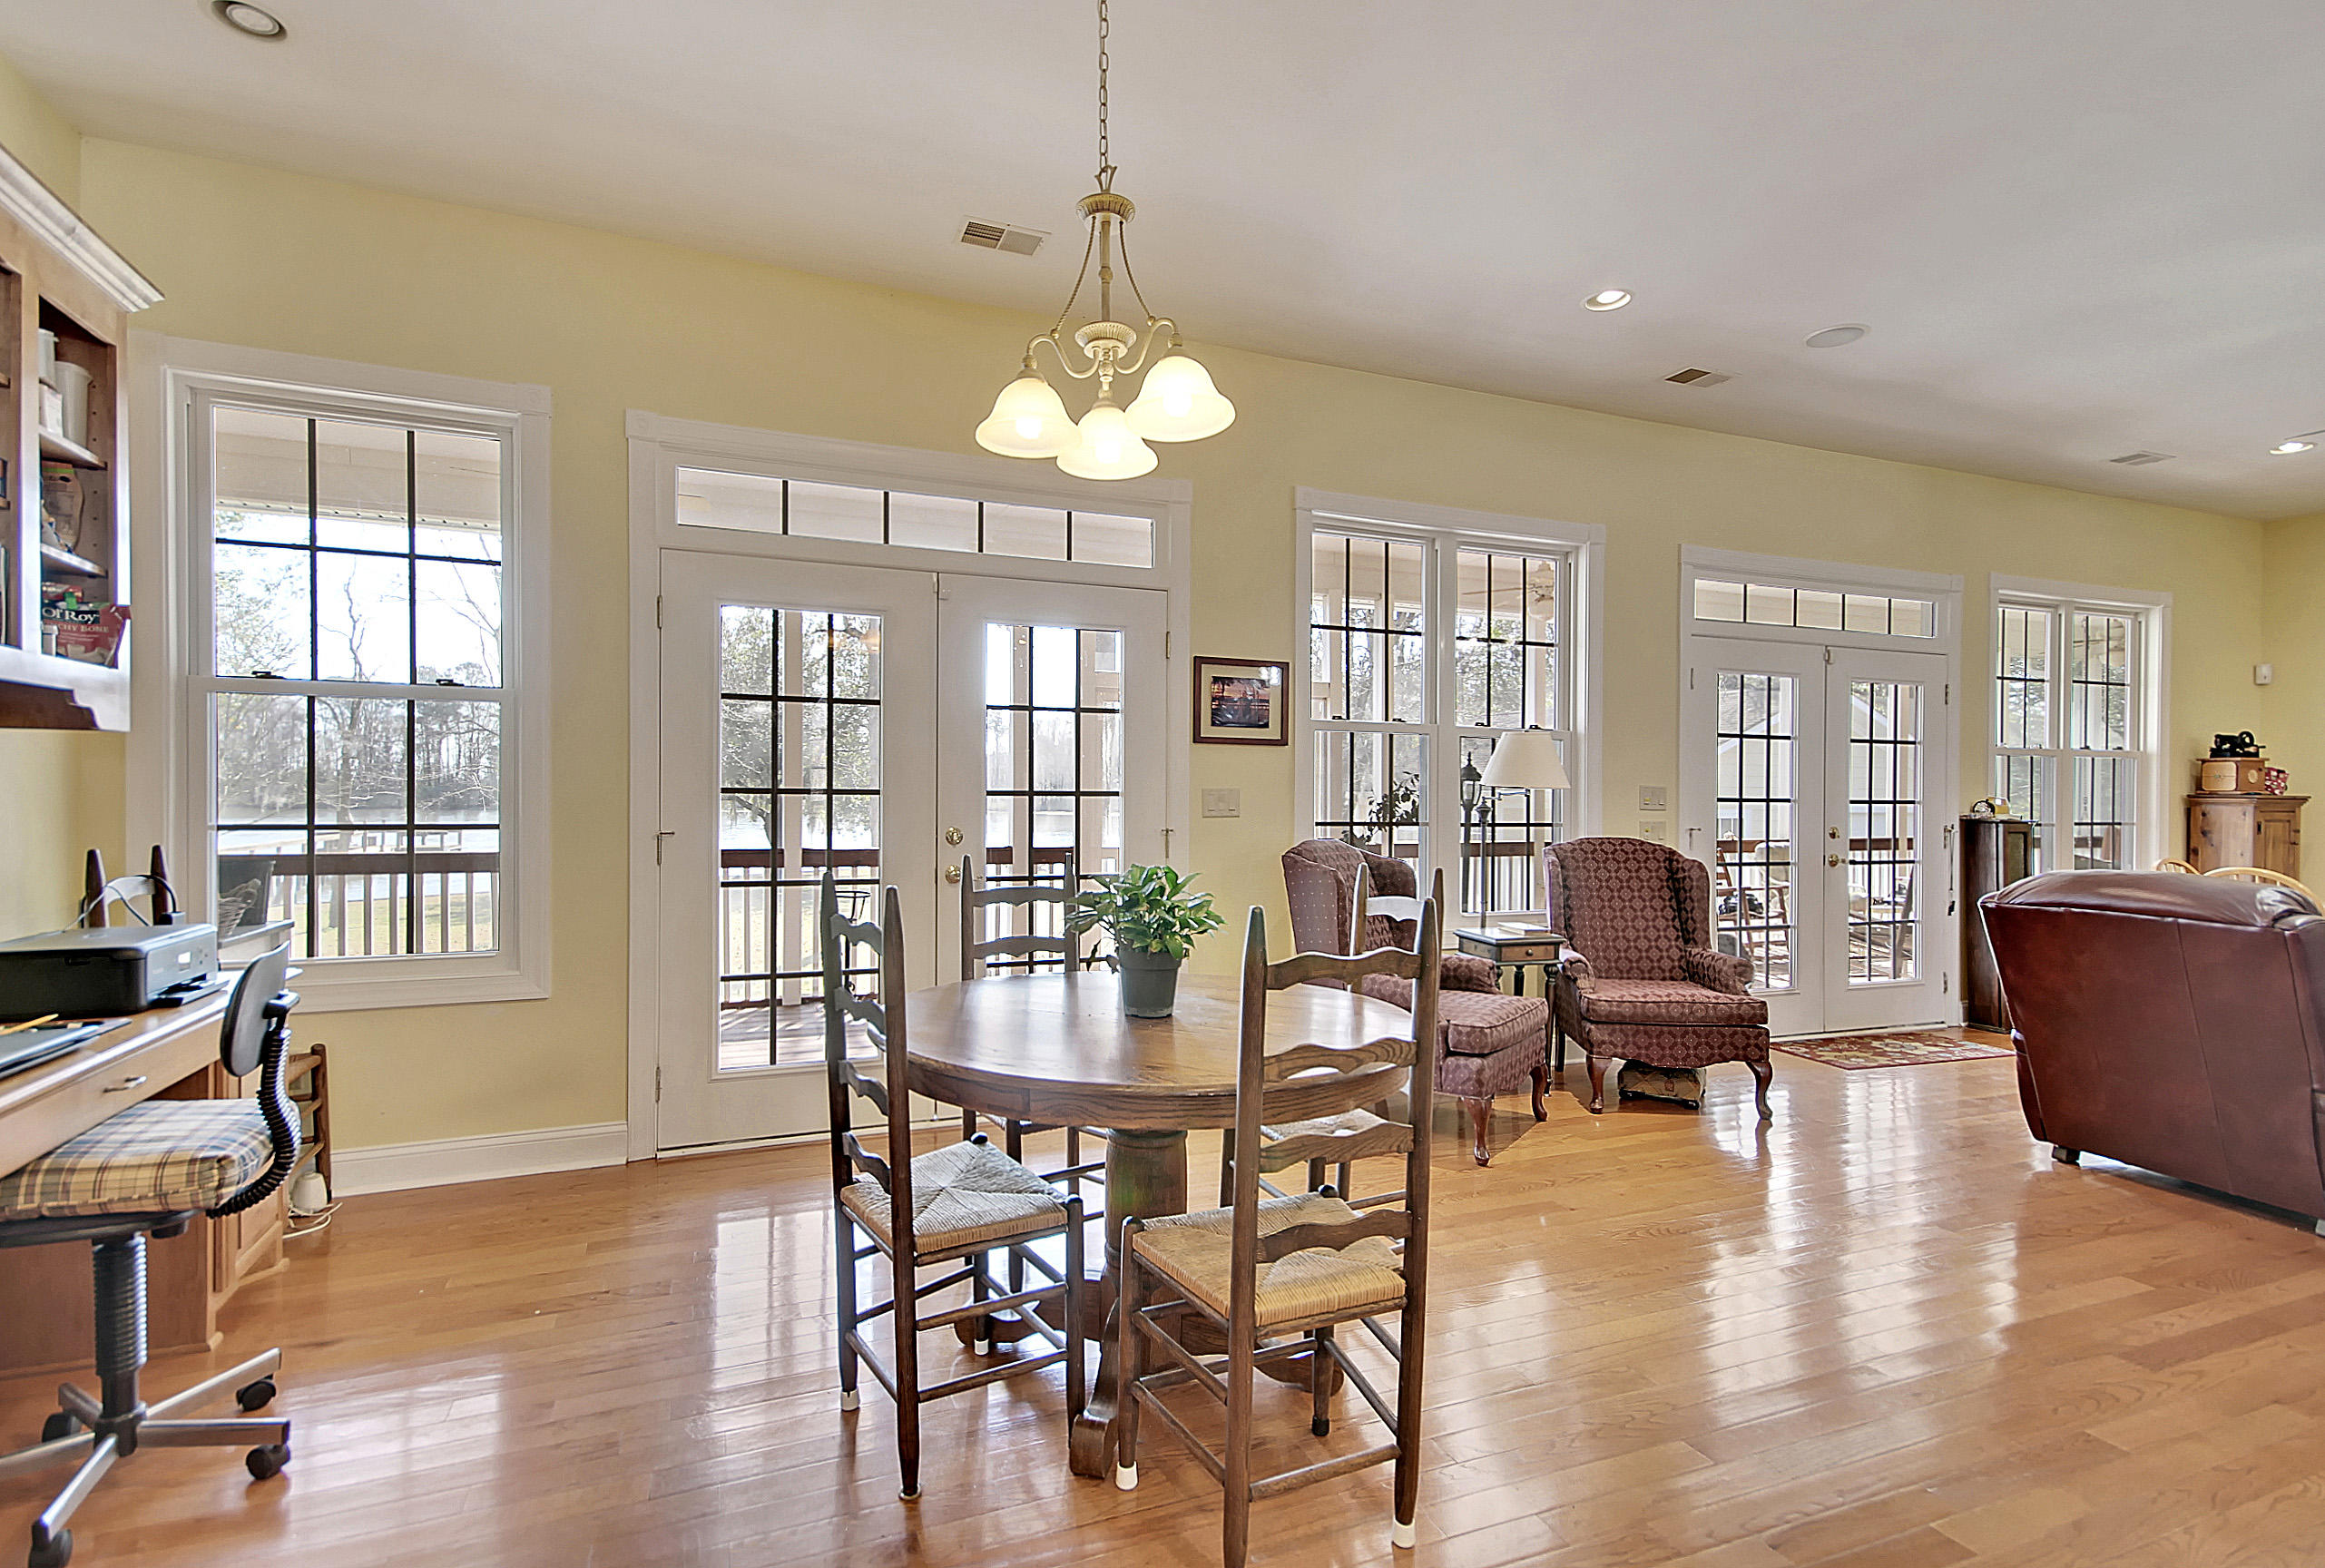 Cross Subd (Longpoint) Homes For Sale - 1191 Longpoint, Cross, SC - 14